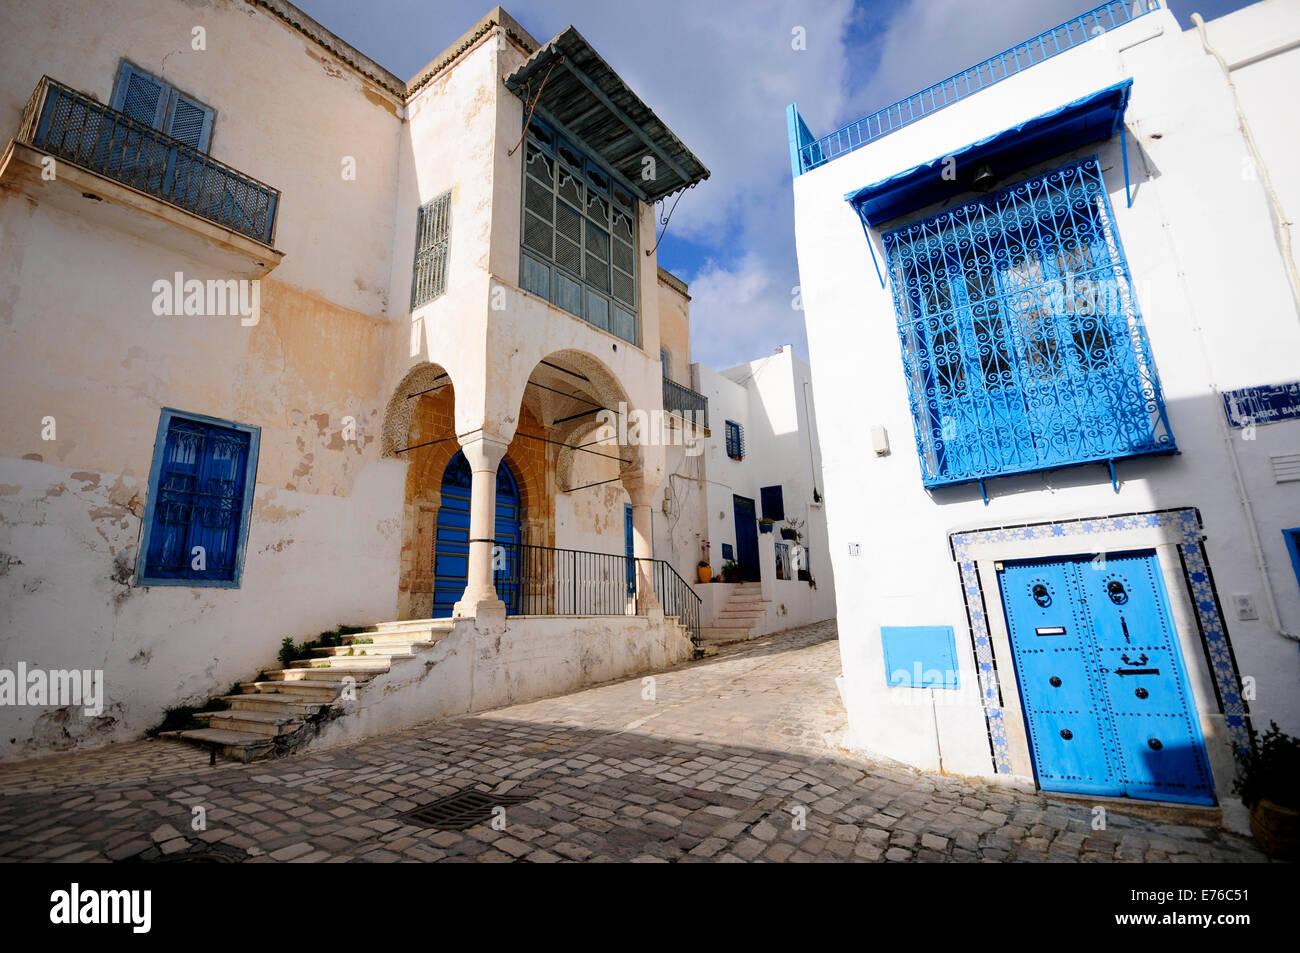 Street of Sidi Bou Said. Sidi Bou Said Andalous village and UNESCO World Heritage near the old Carthage - Stock Image